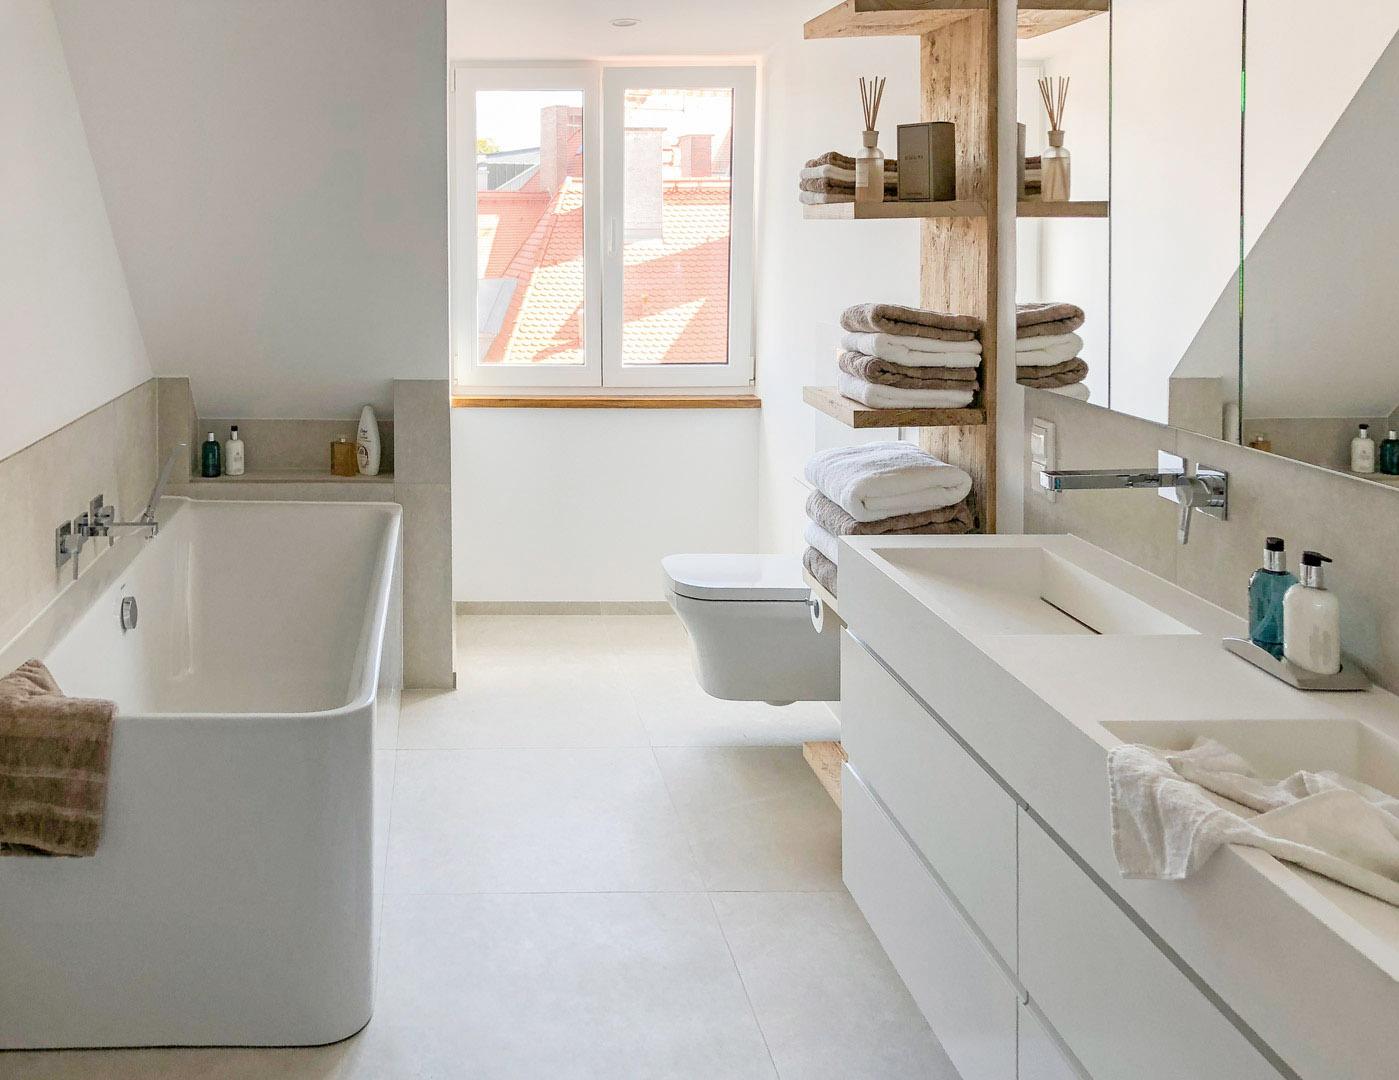 Badezimmer-Regal als Raumtrenner